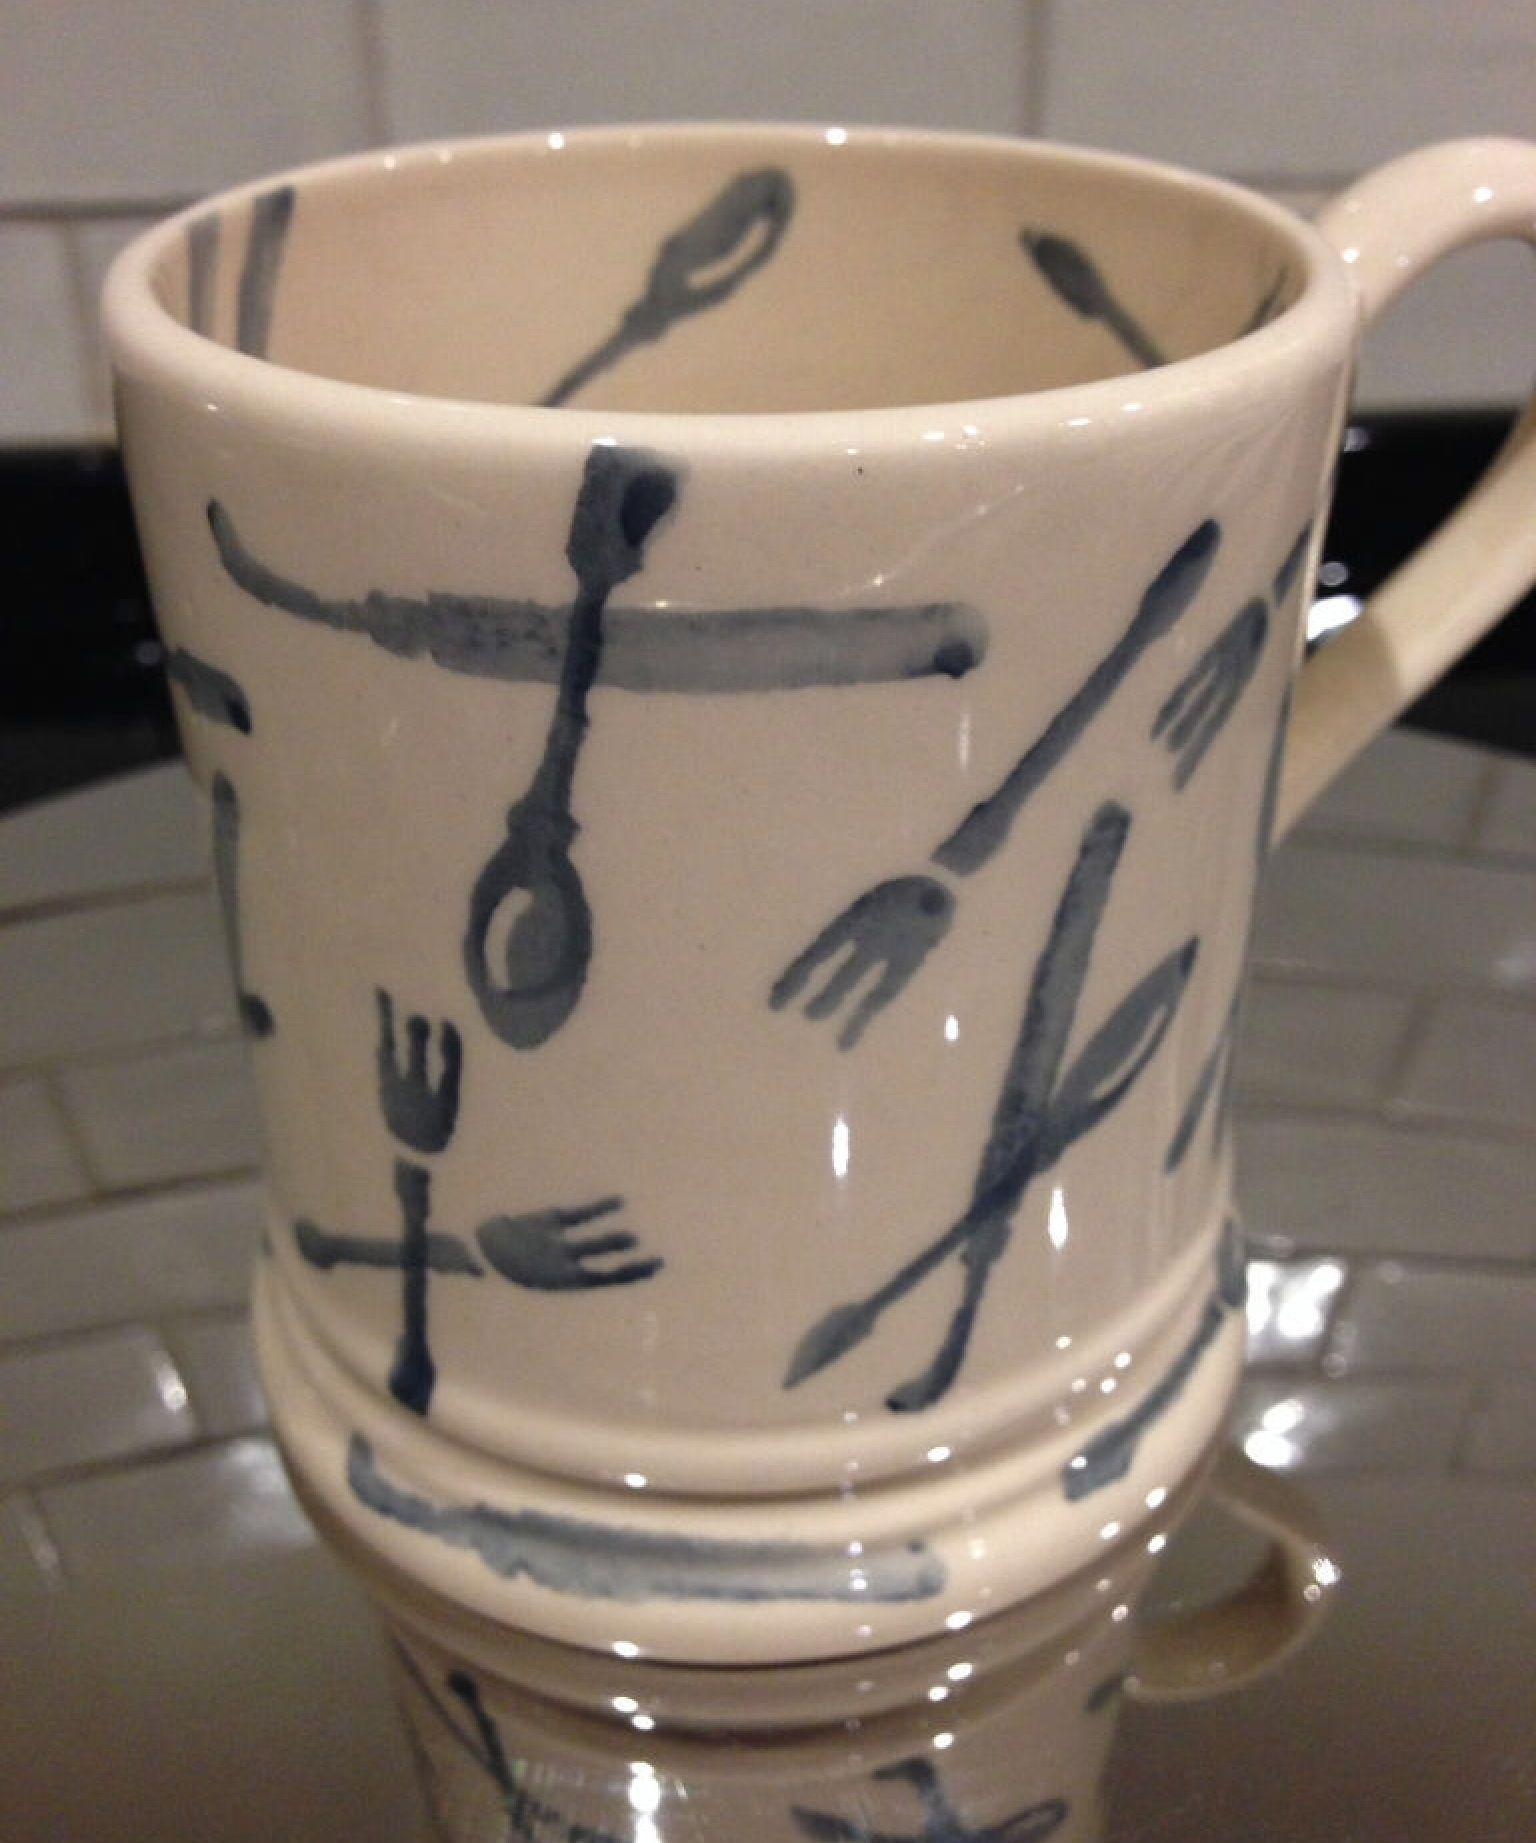 Emma Bridgewater Conran Utensils 0.5 Pint Mug